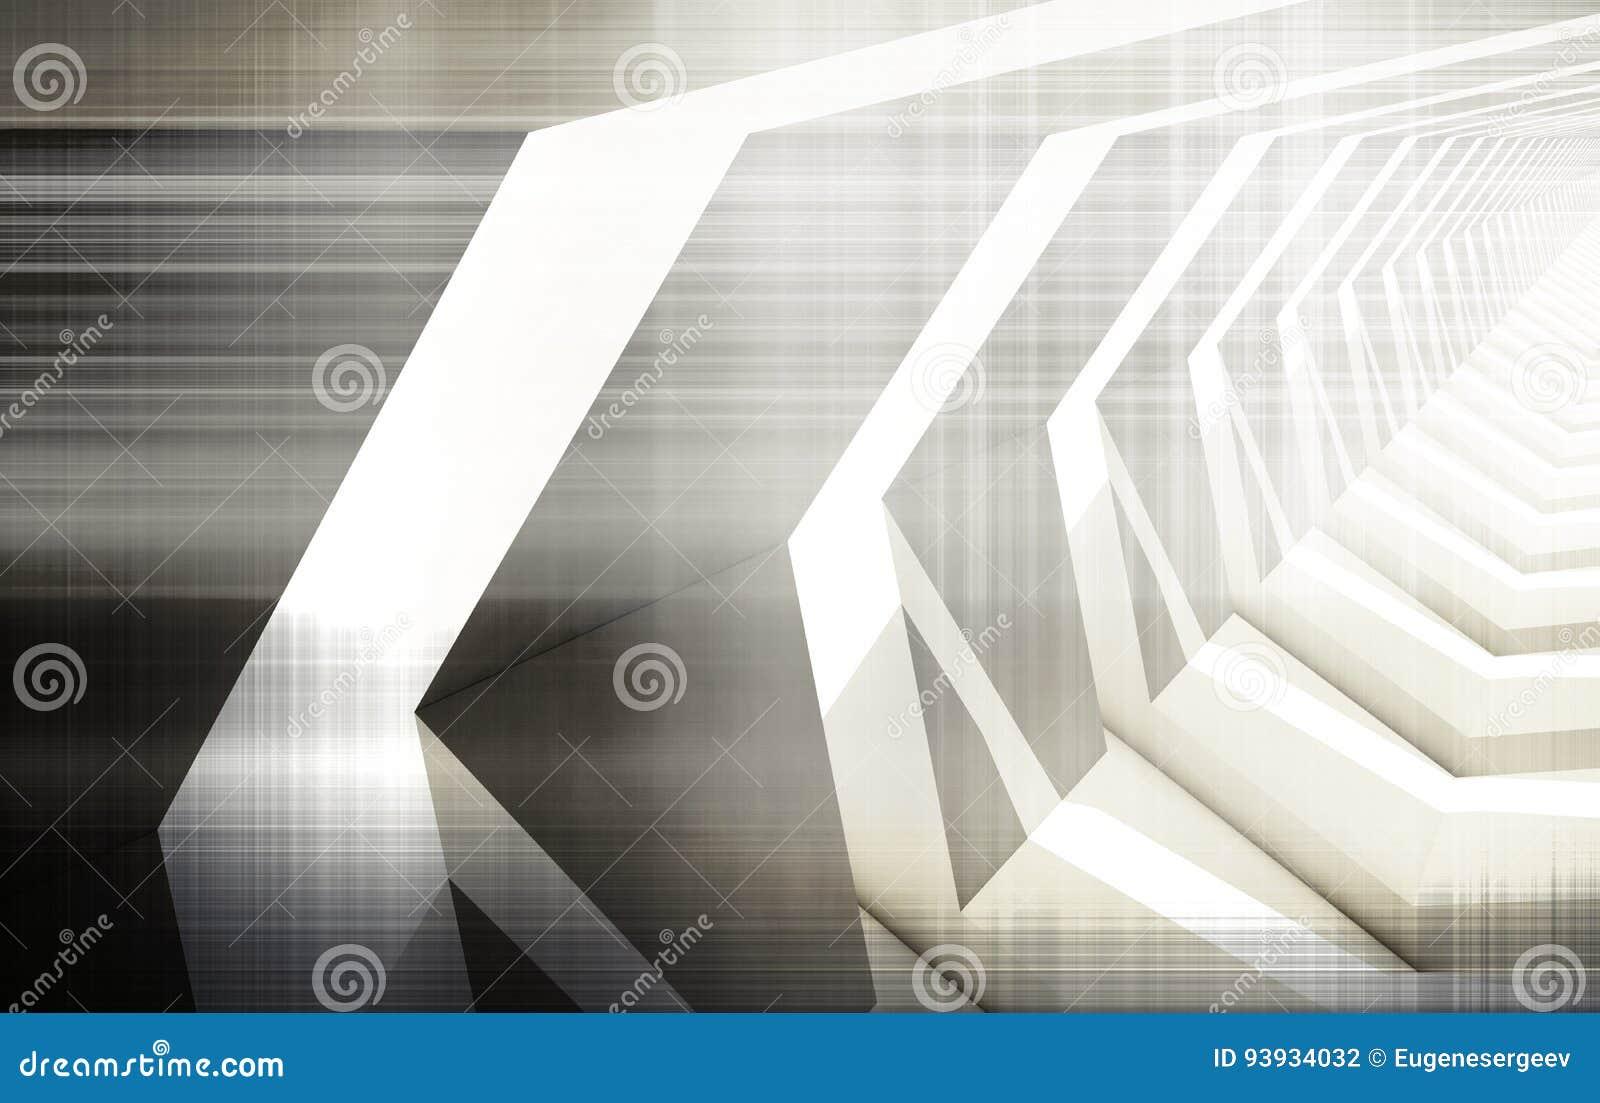 Abstract digital background, high-tech render